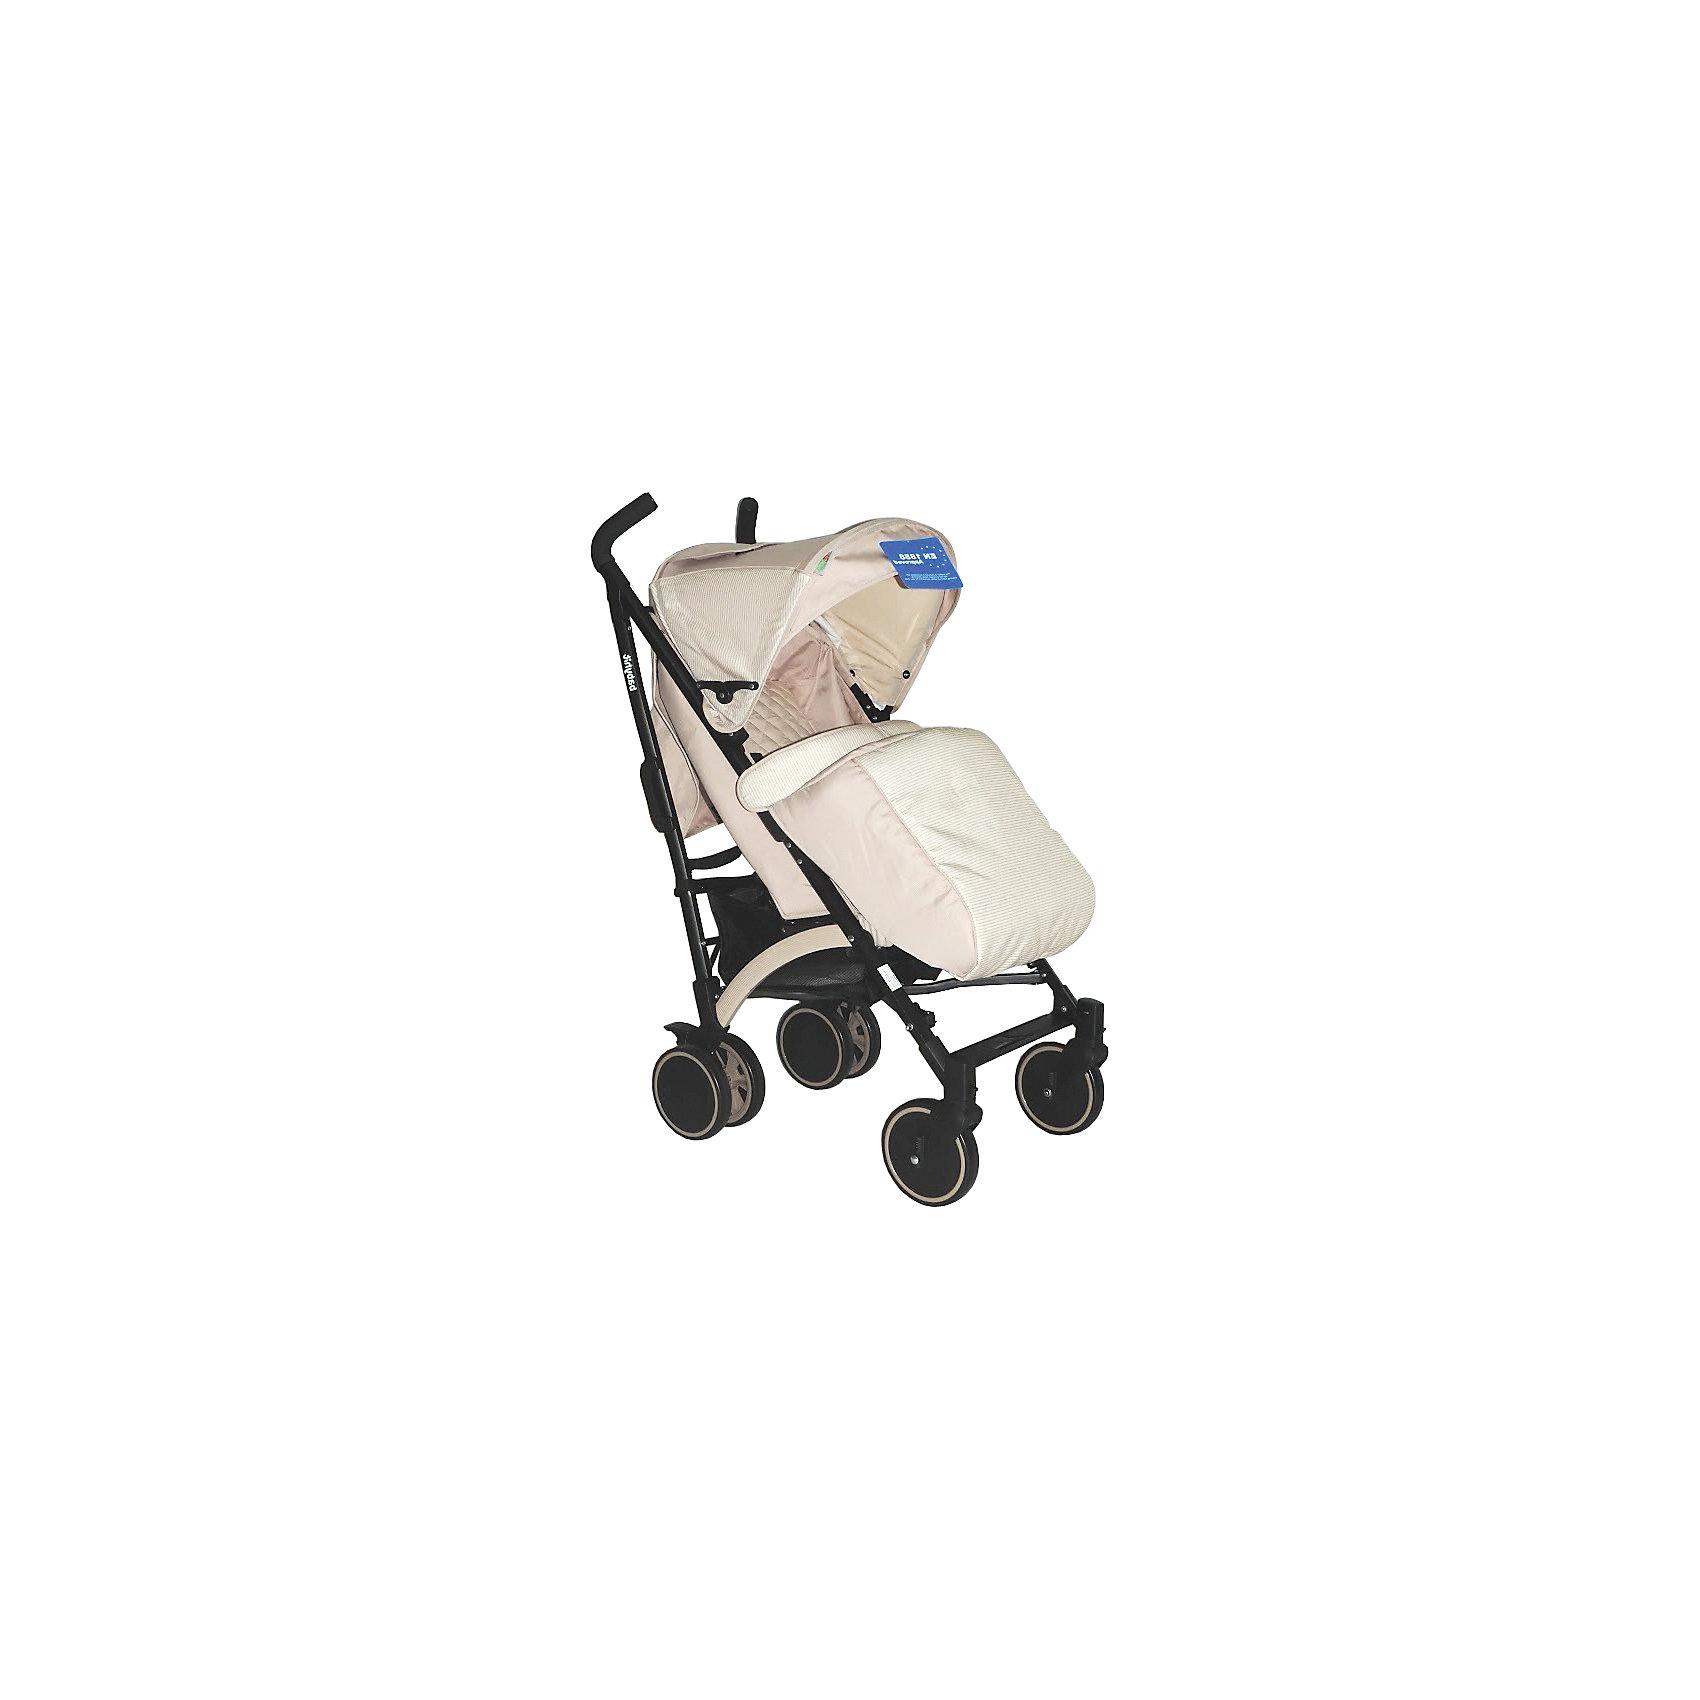 Baby Hit Коляска-трость RAINBOW, BabyHit, прогулочная коляска cool baby kdd 6699gb t fuchsia light grey